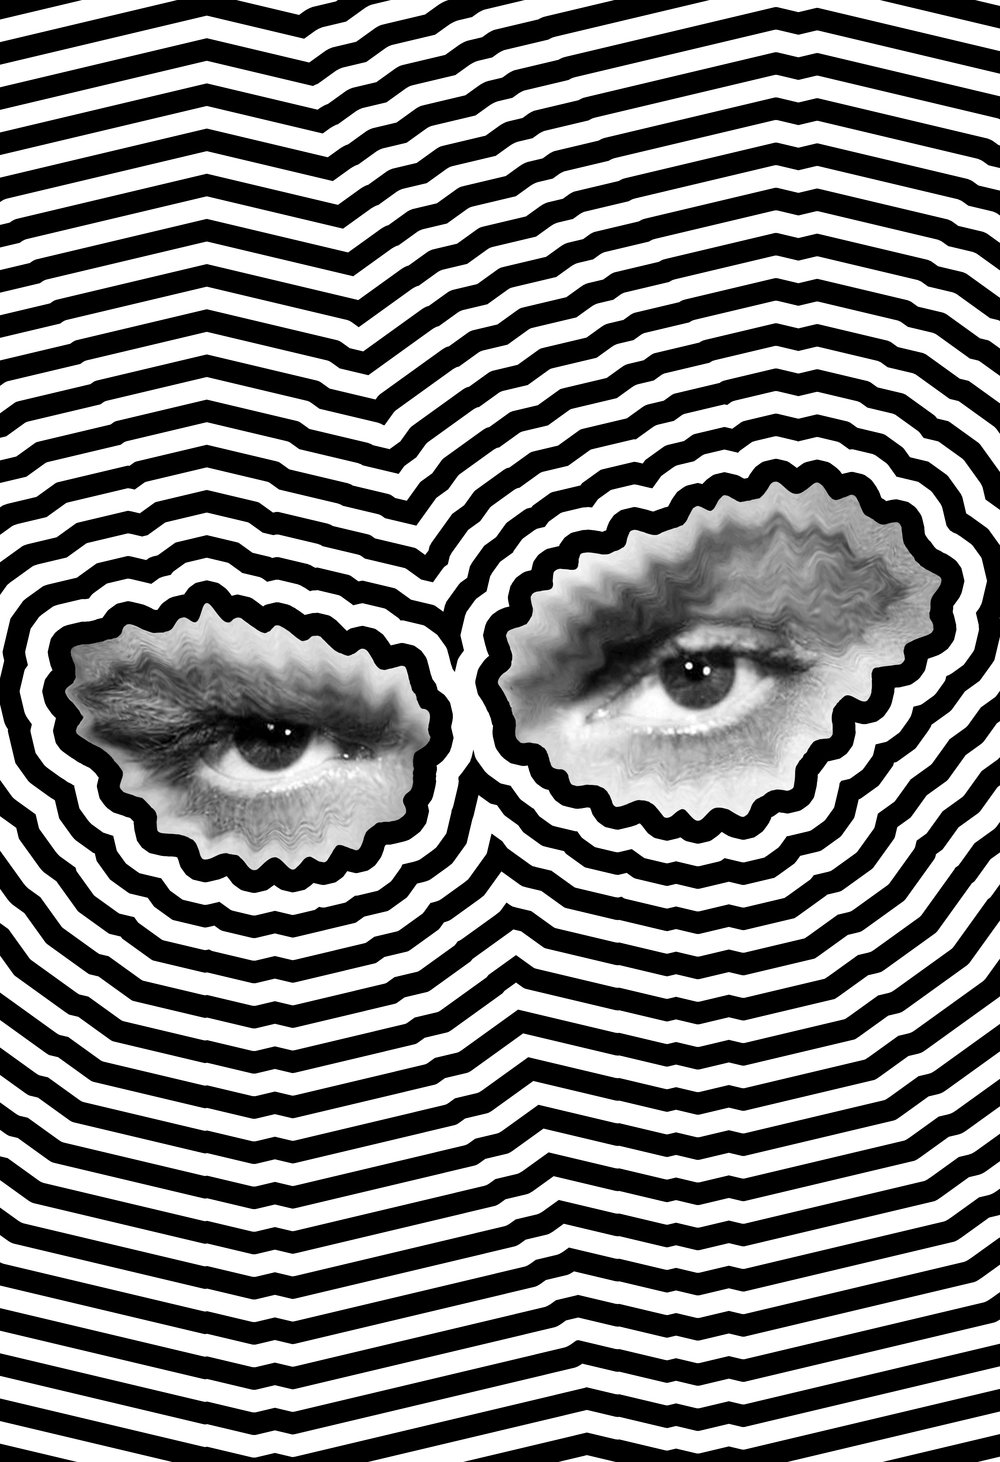 dead eyes.jpg